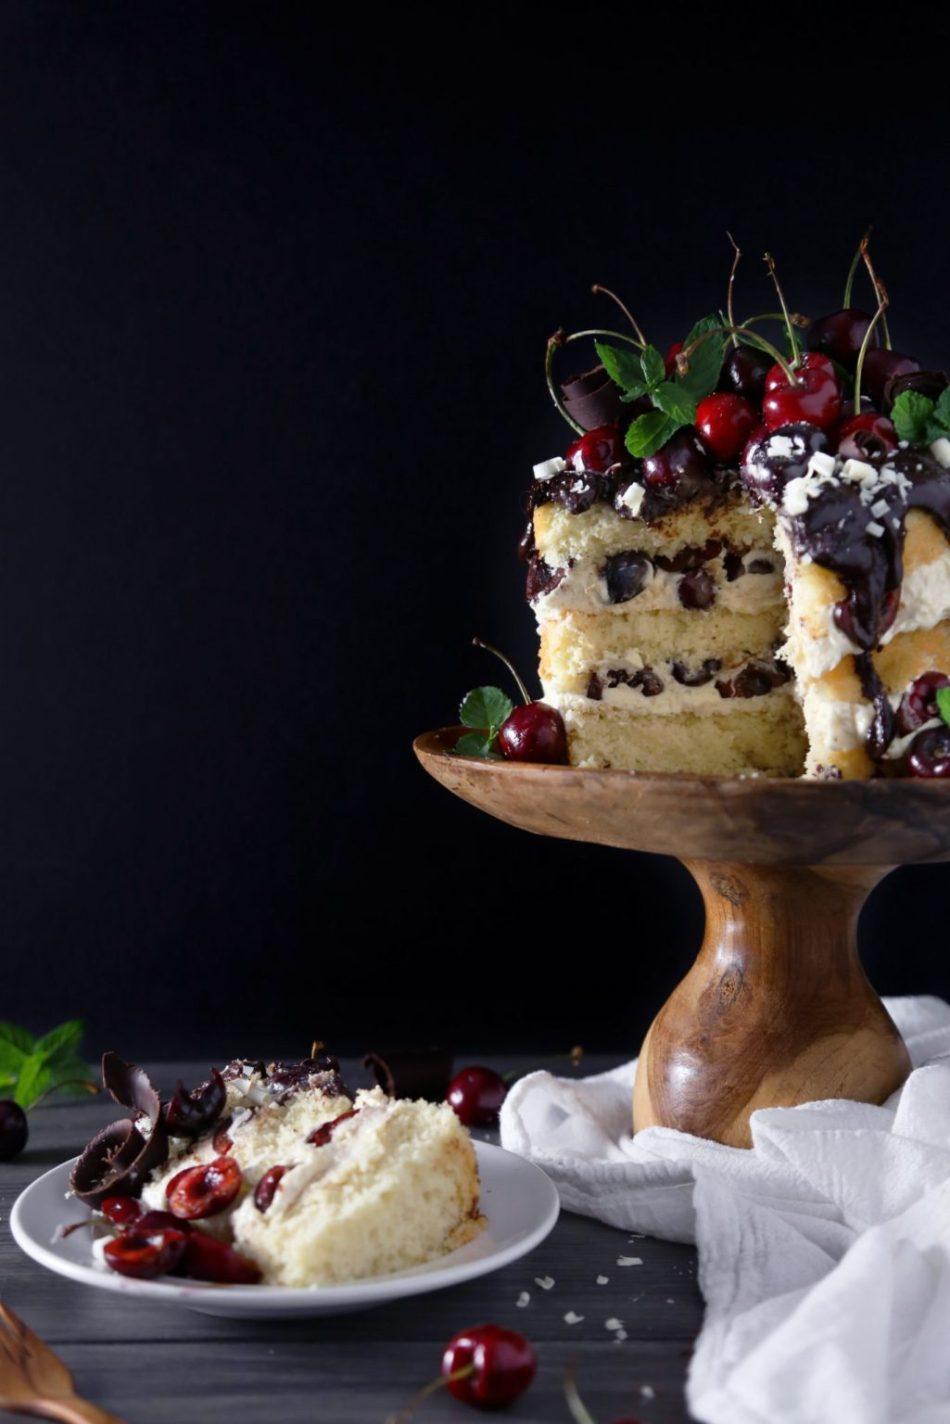 White Forest Cake | Gluten, dairy, and refined sugar free vanilla cake is topped with white chocolate buttercream, cherries, and dark chocolate ganache.